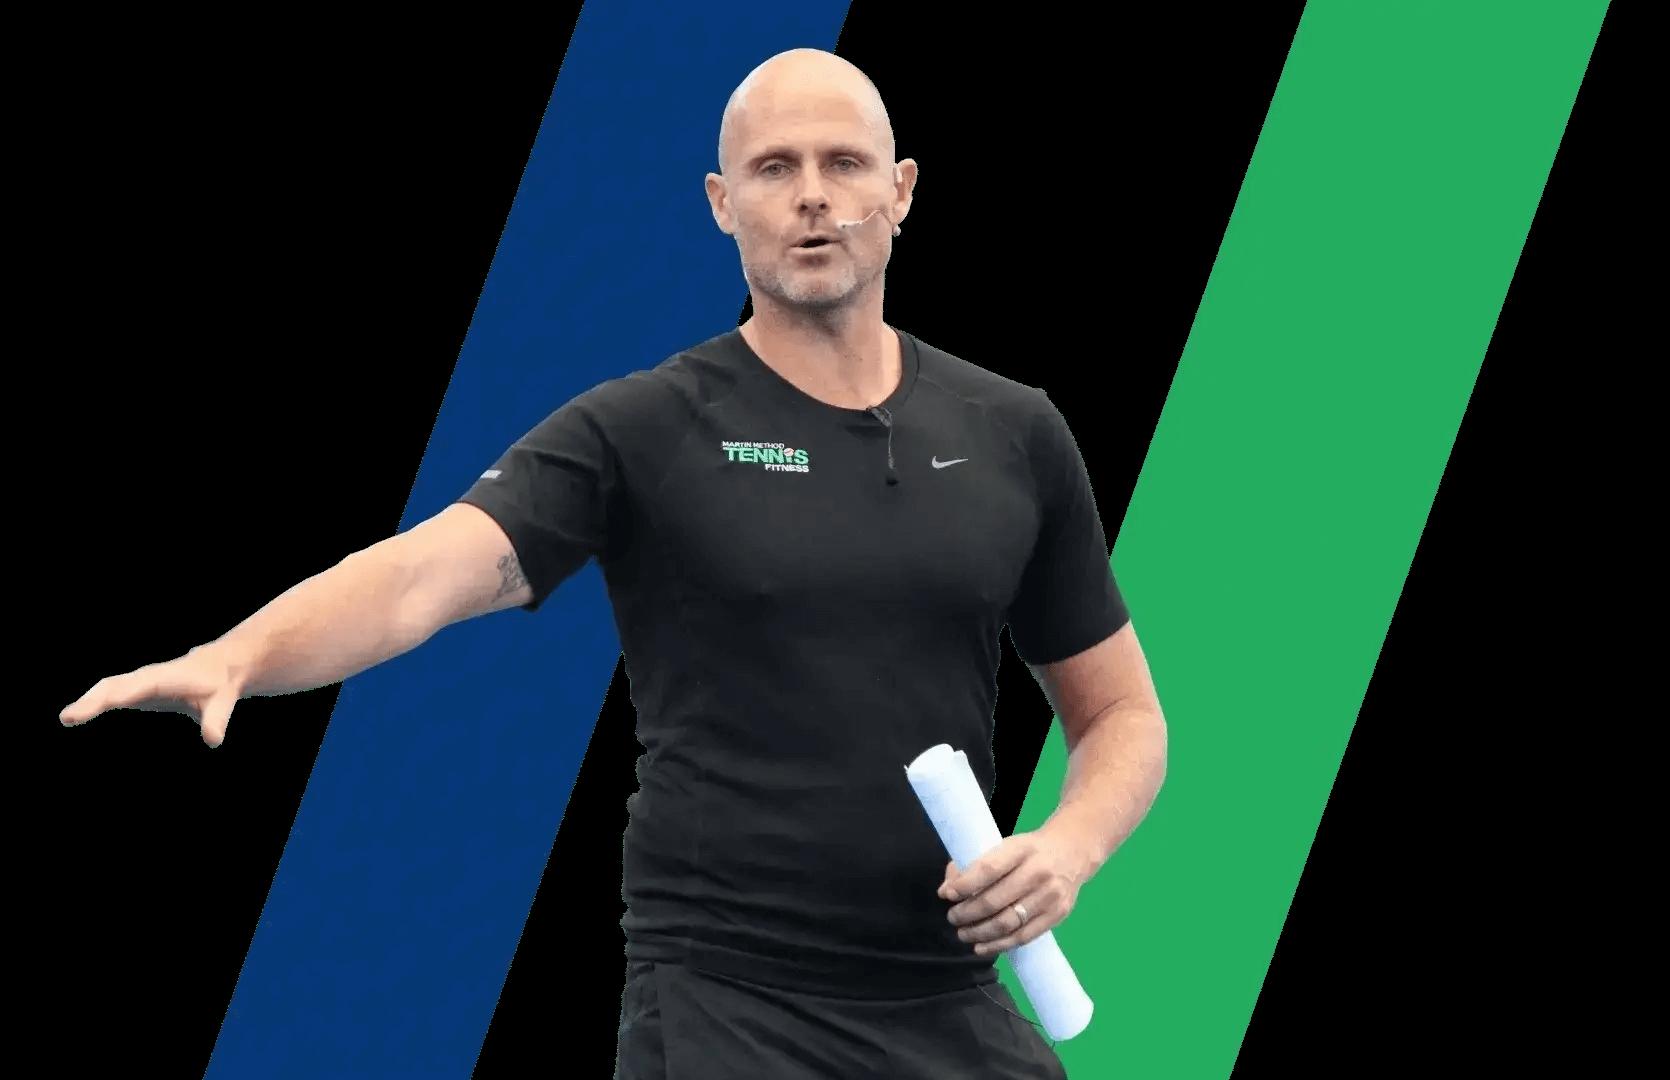 7-best-tennis-exercises